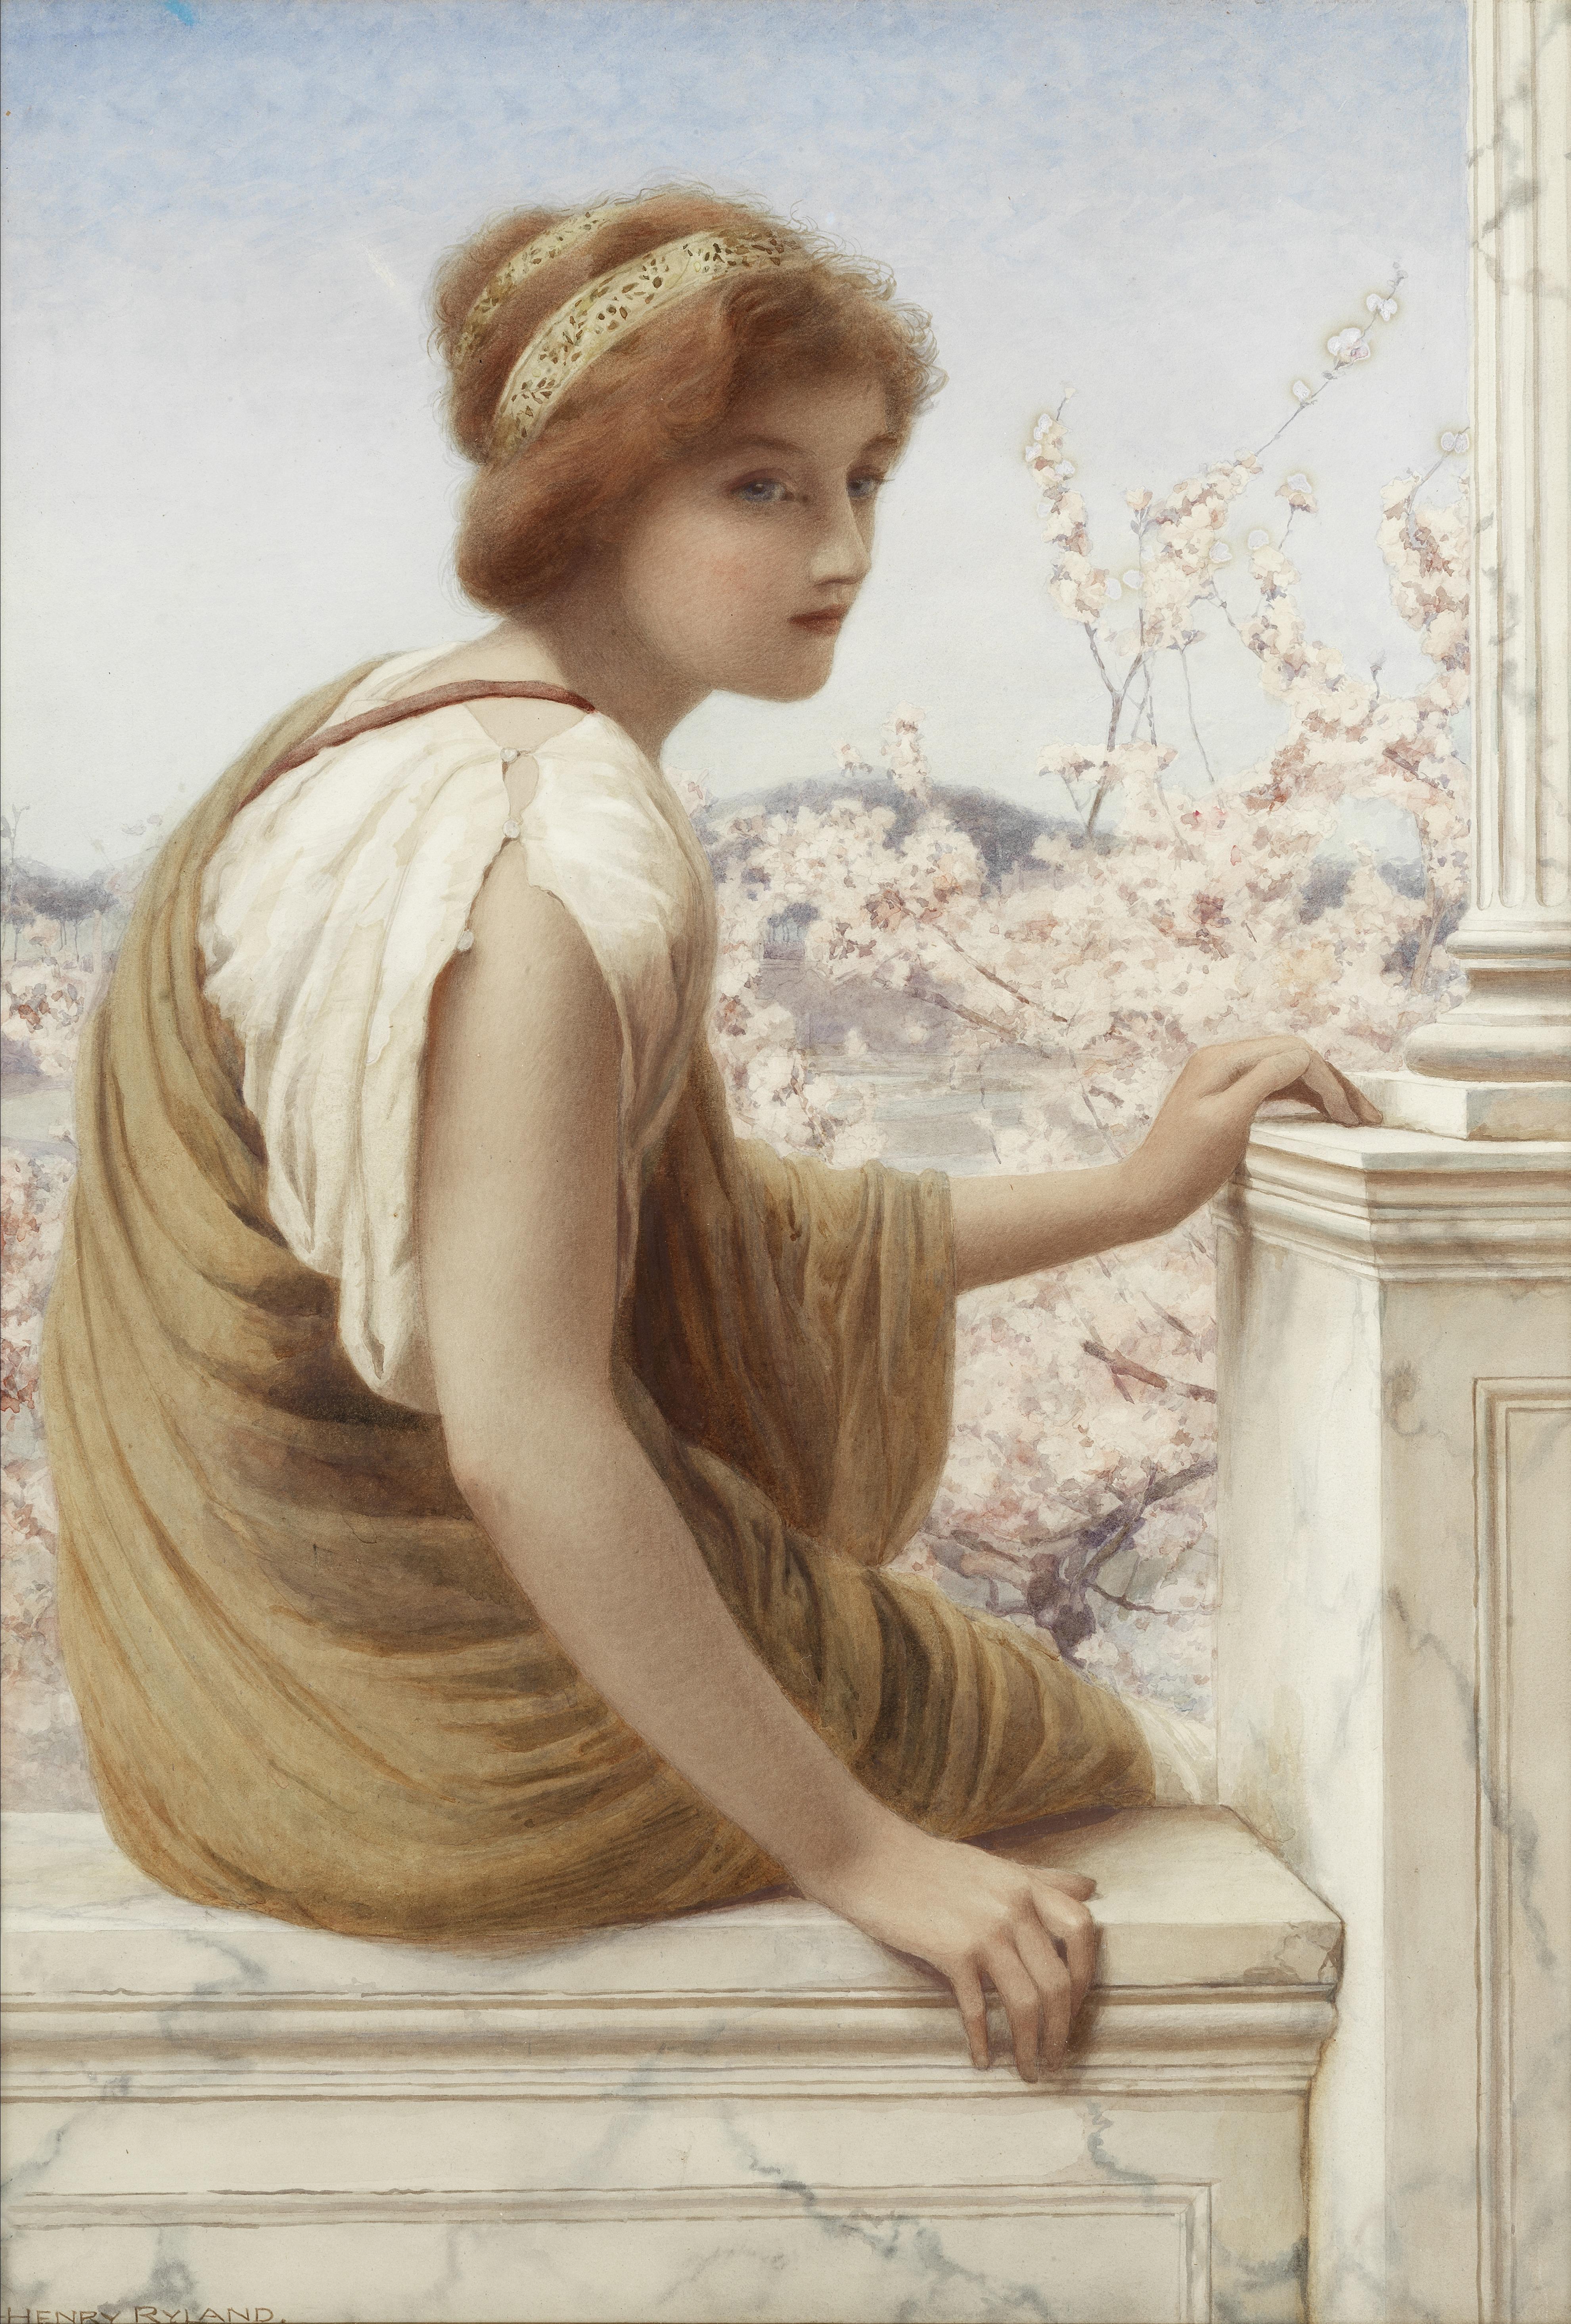 Henry Ryland (British, 1856-1924) Apple blossom